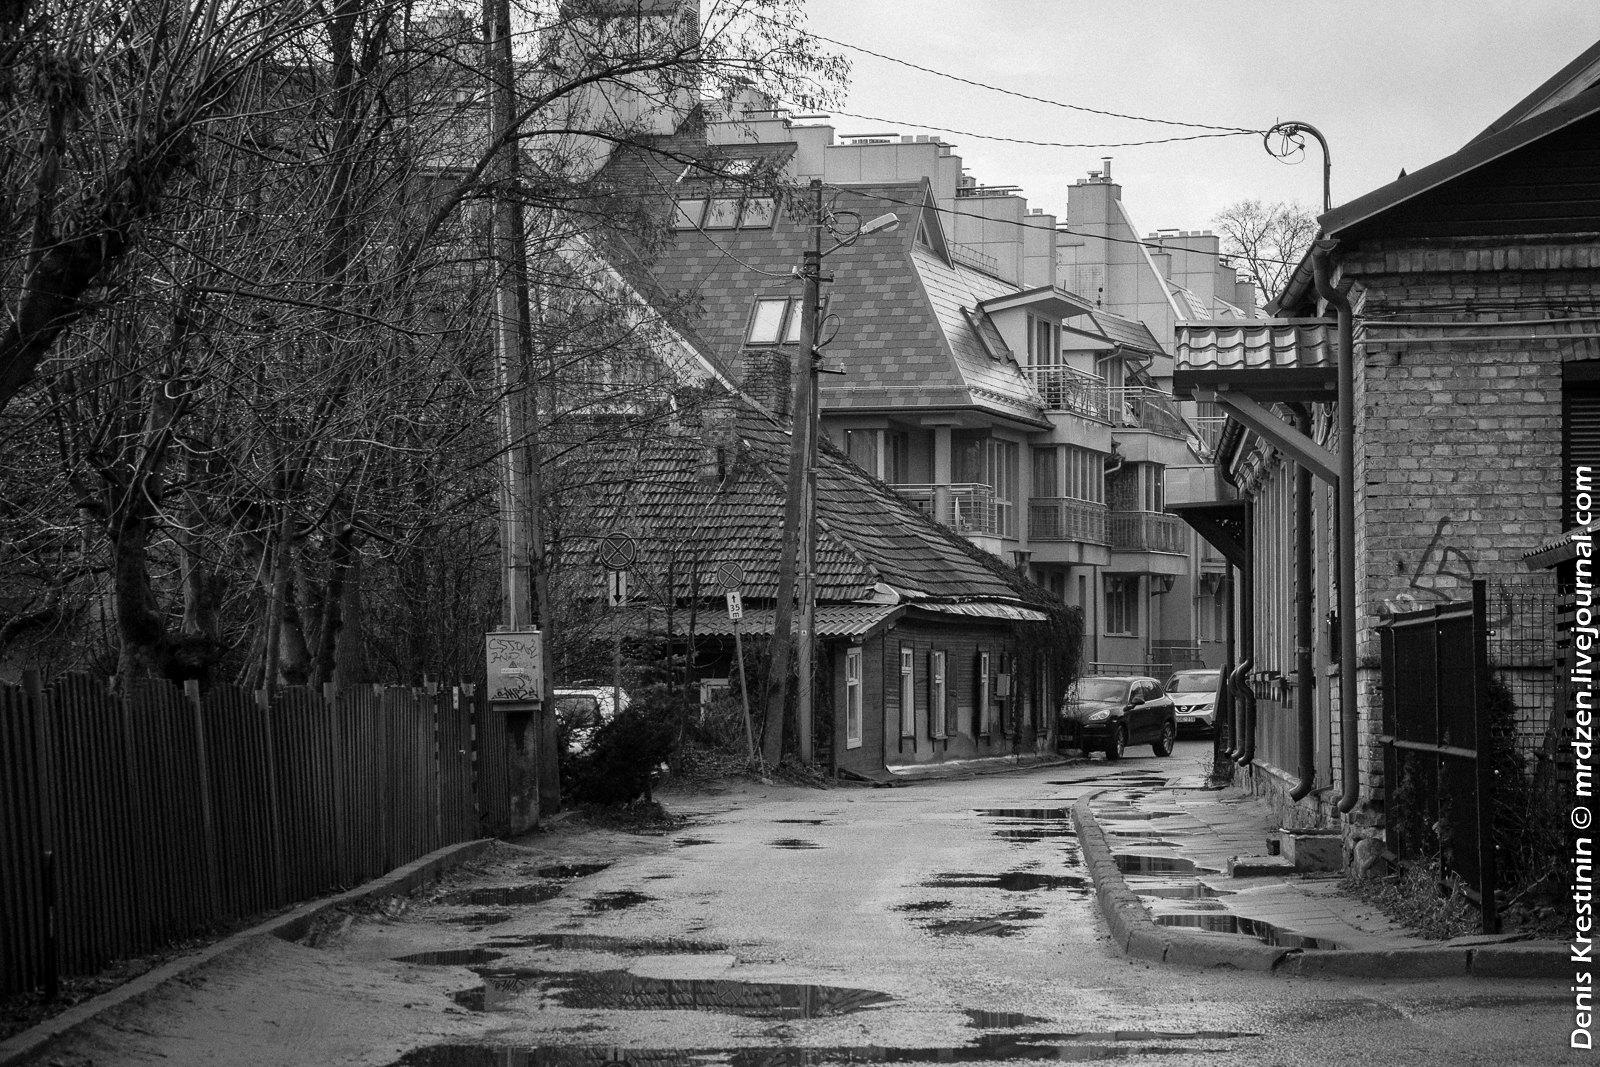 Вильнюс. Район Ужупис (Заречье).